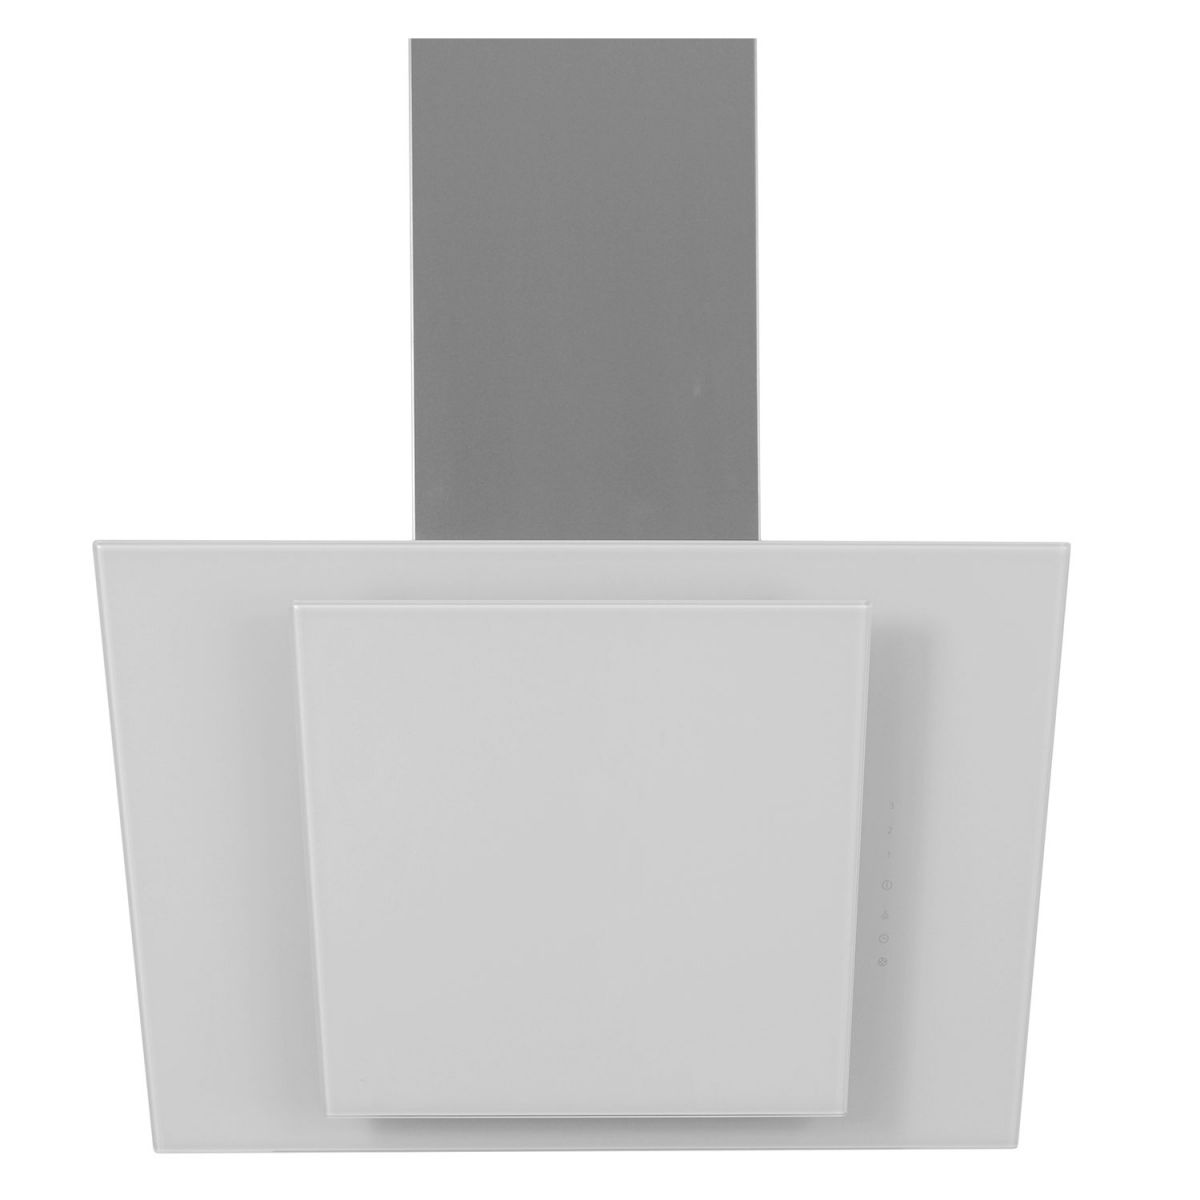 myappliances art28206 60cm ice white angled glass chimney. Black Bedroom Furniture Sets. Home Design Ideas